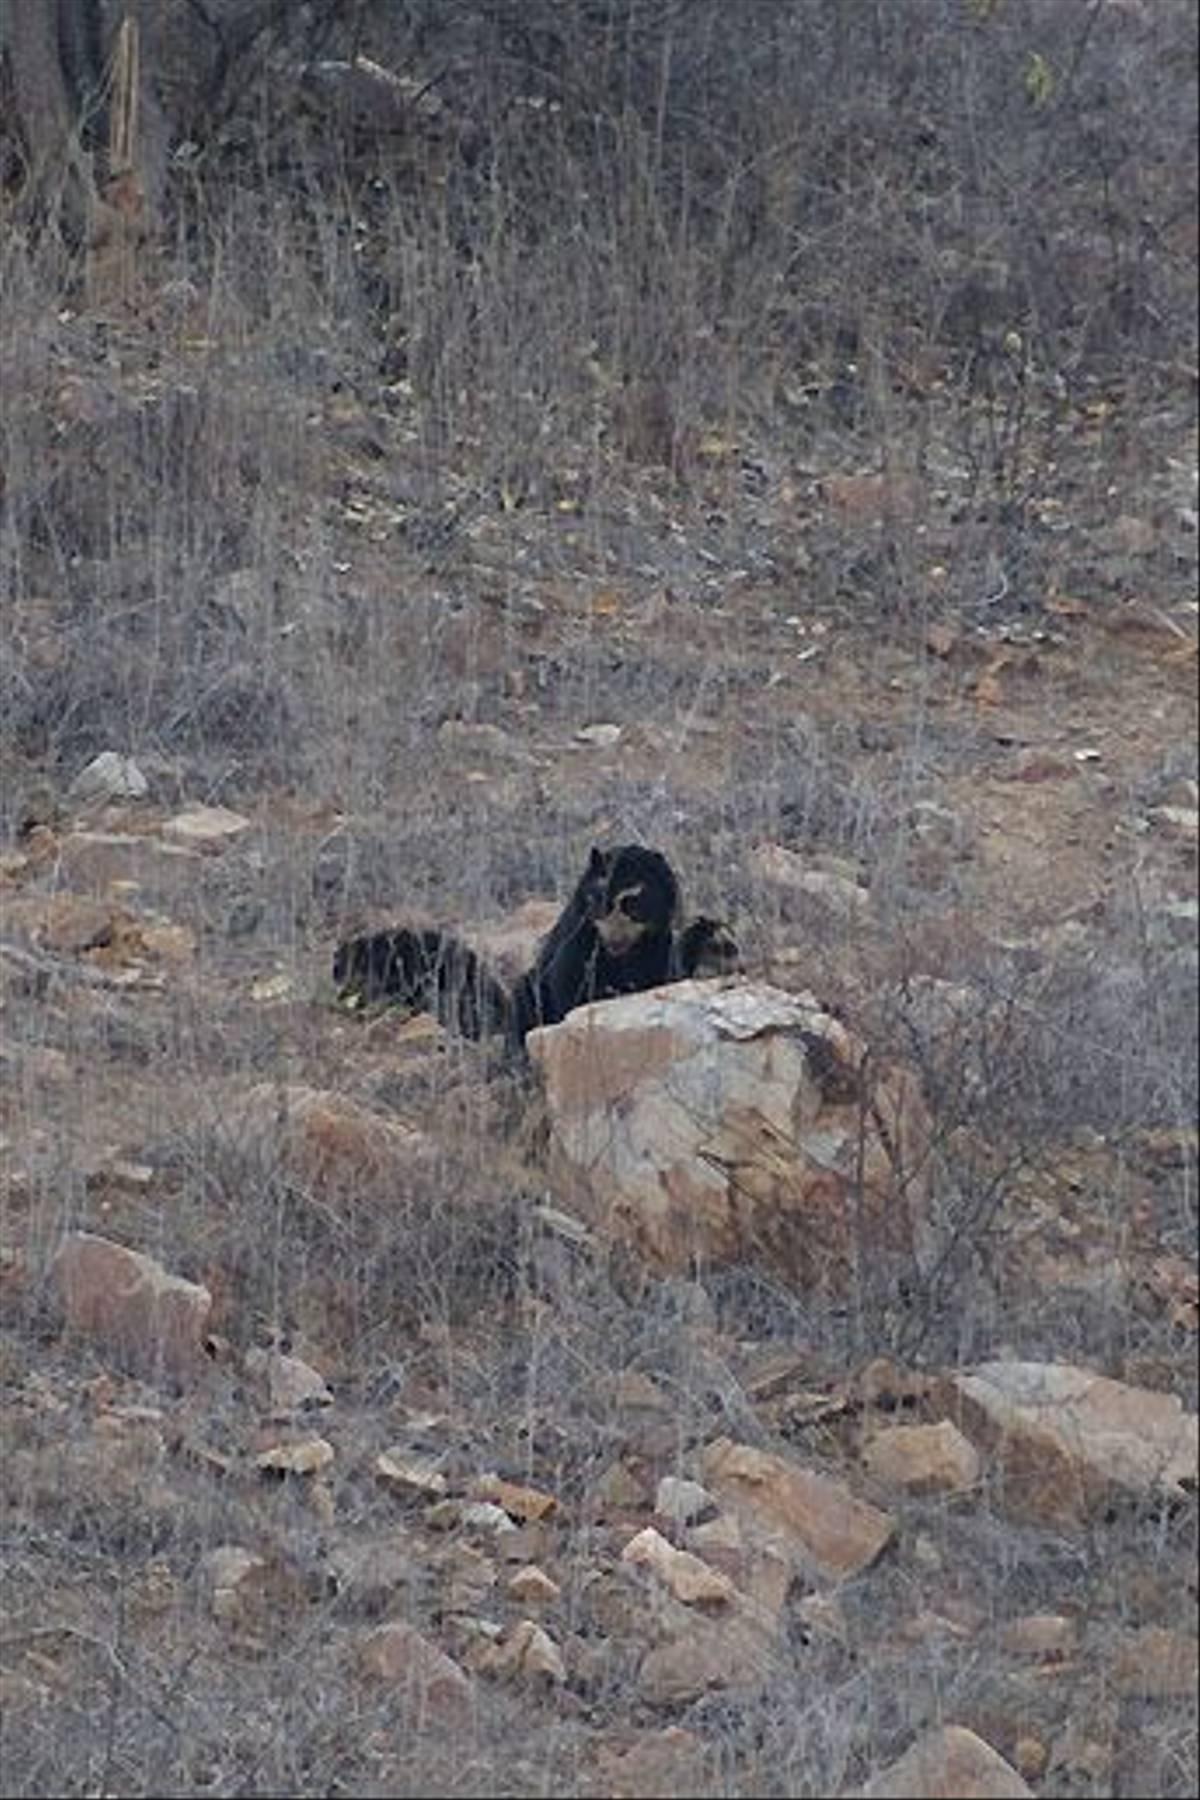 Spectacled Bear, Chaparri Lodge (David Allison)